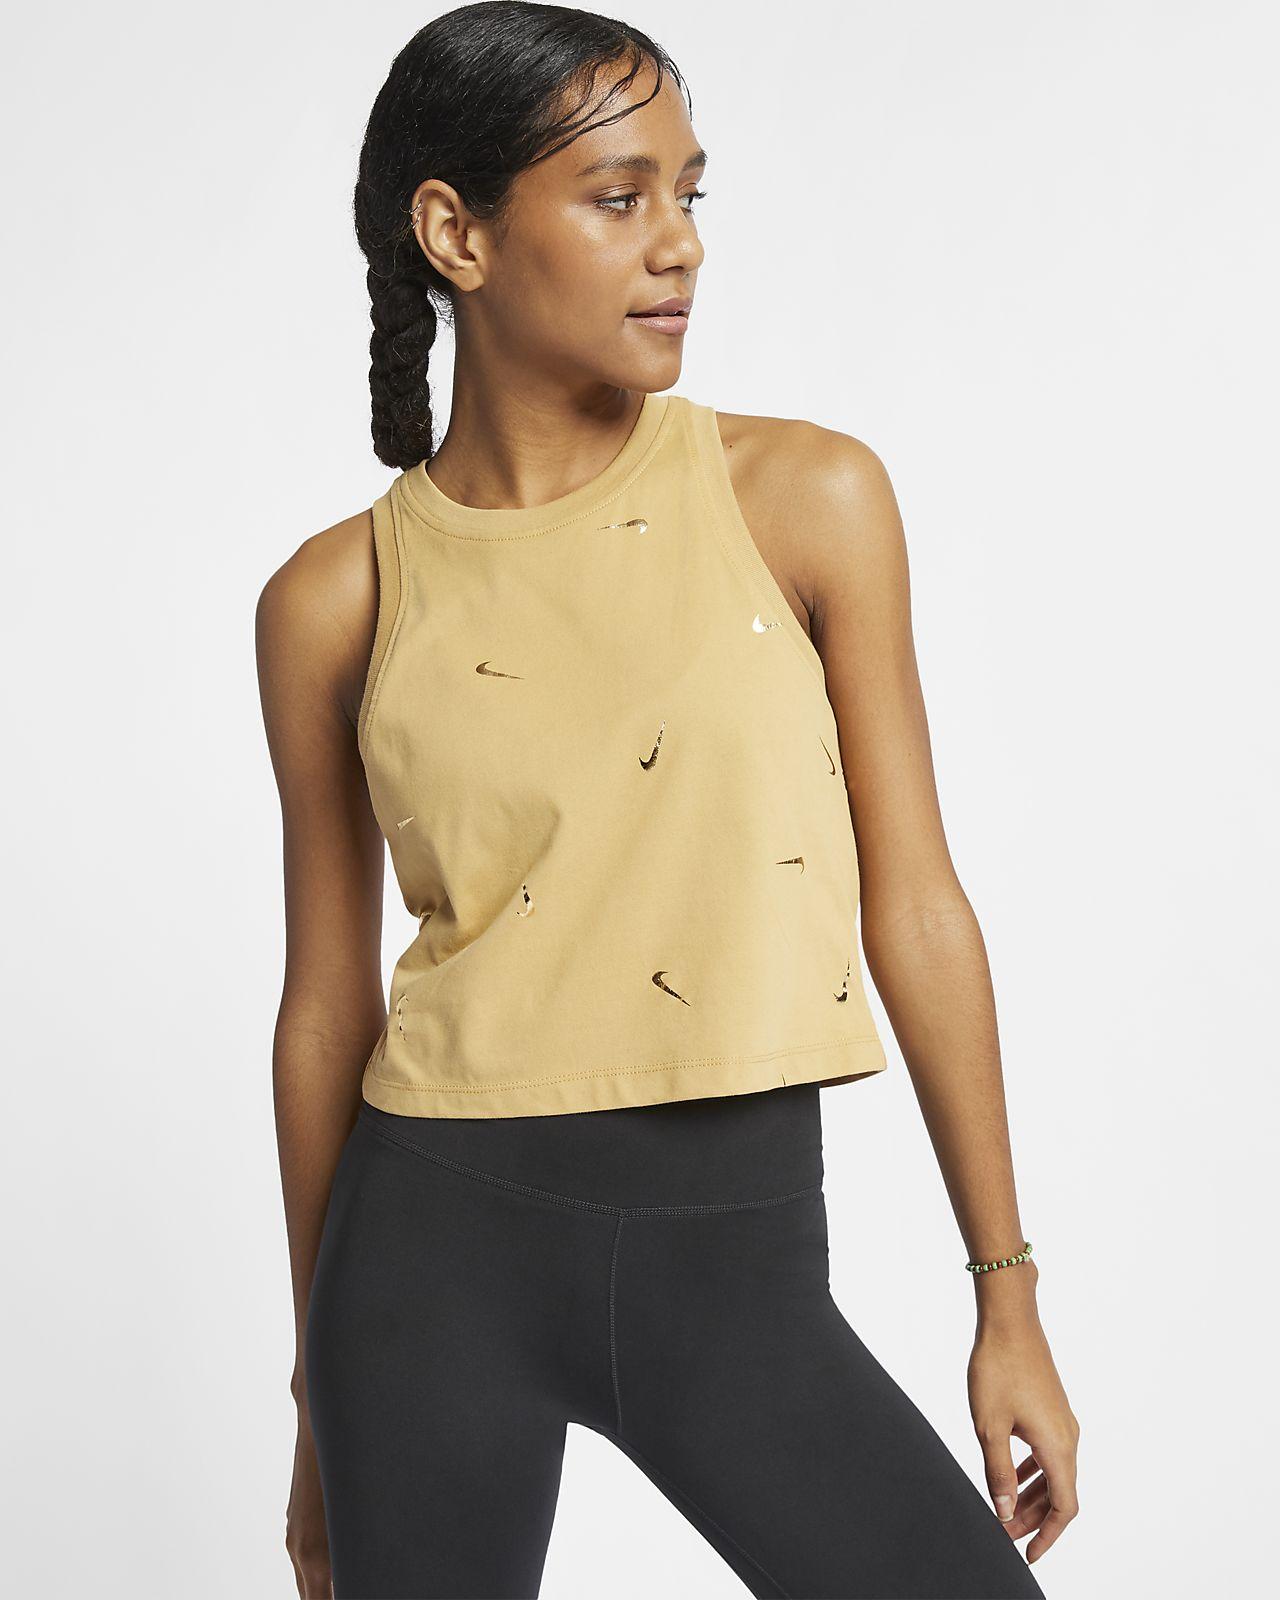 Dri Nike Tirantes De Camiseta Mujer Para Fit Entrenamiento v6xnBw